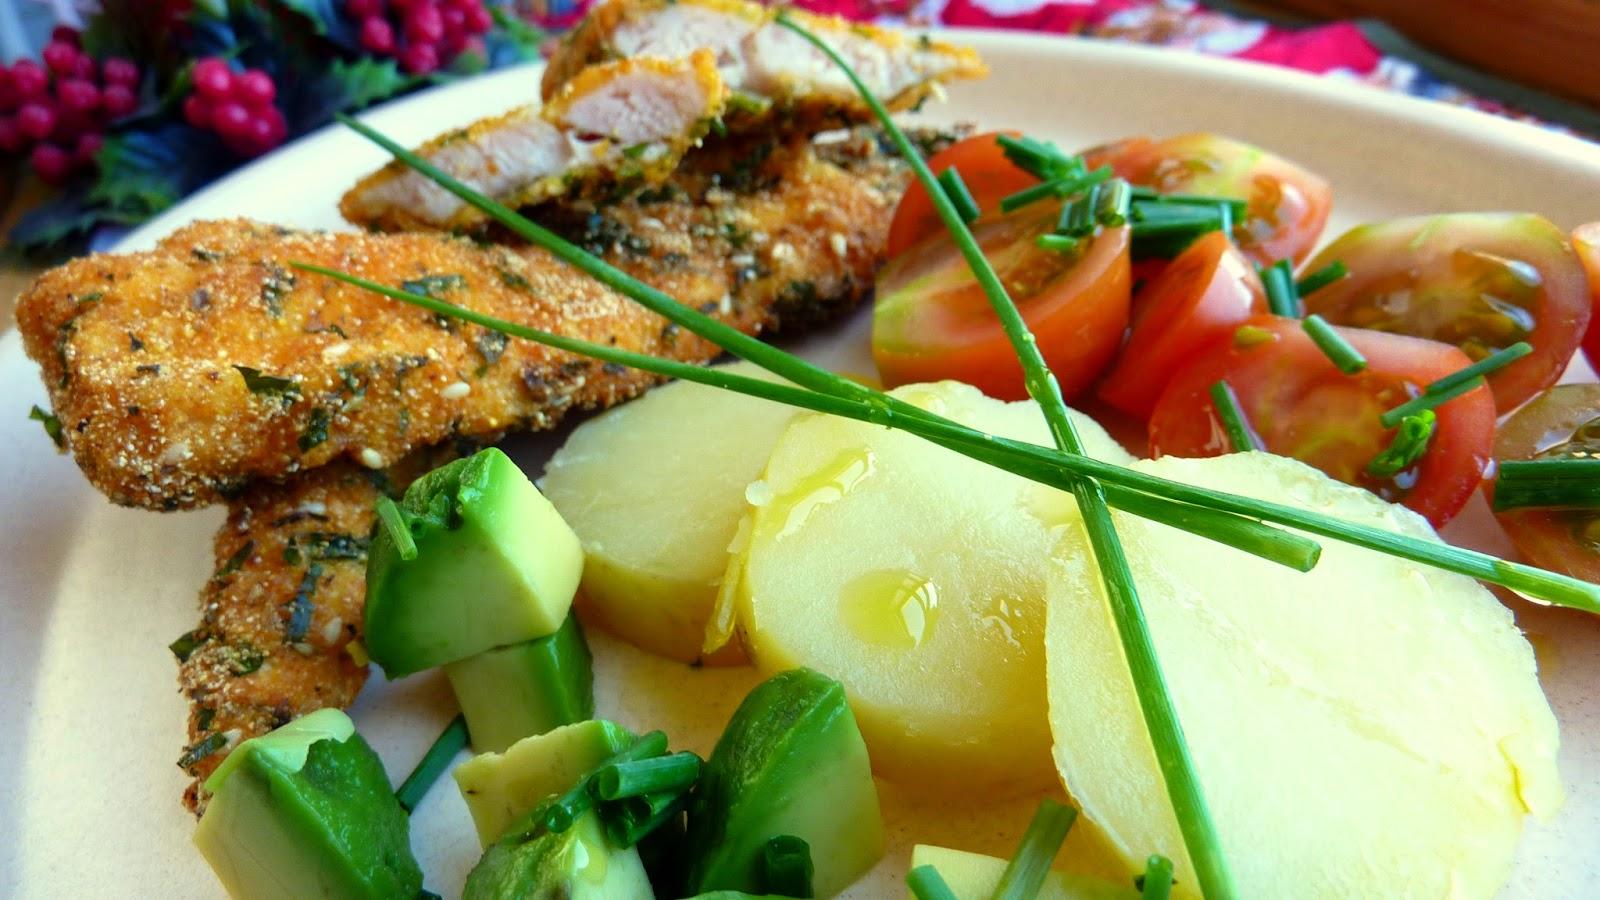 Receta: pollo apanado sin pan, gluten ni lácteos